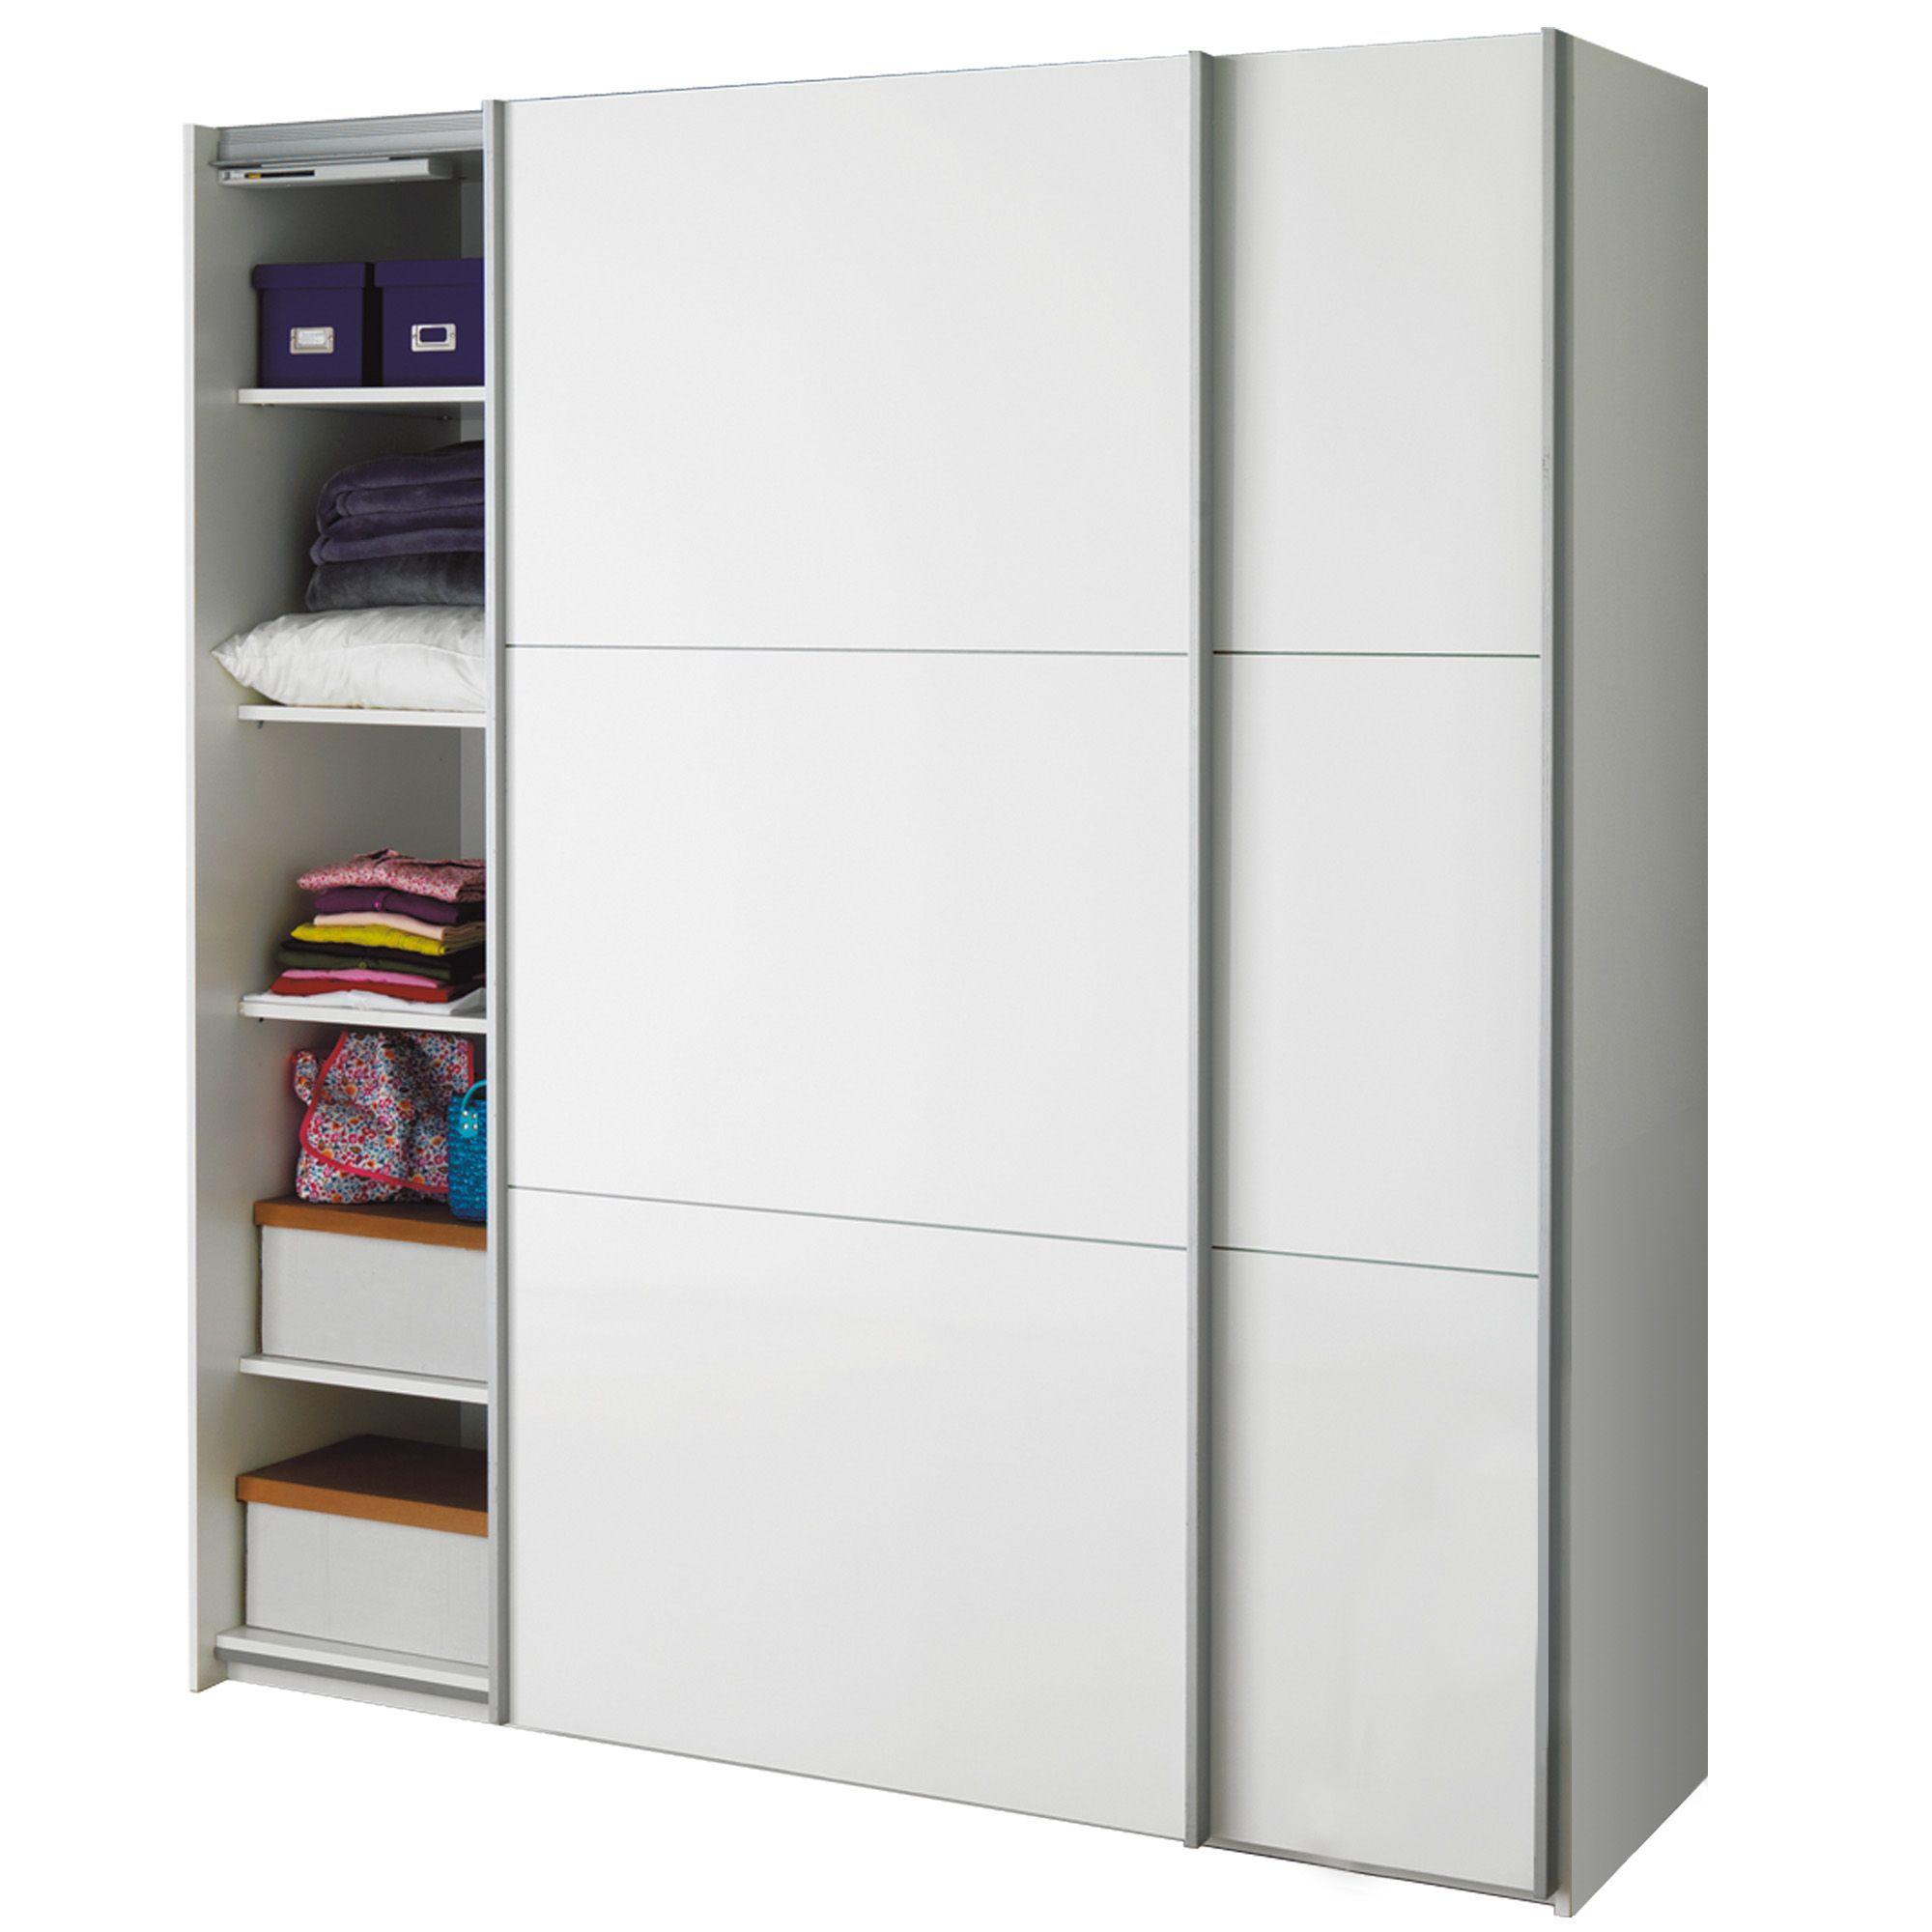 armoire 2 portes coulissantes blanc laqu u00e9 brillant - nuvola